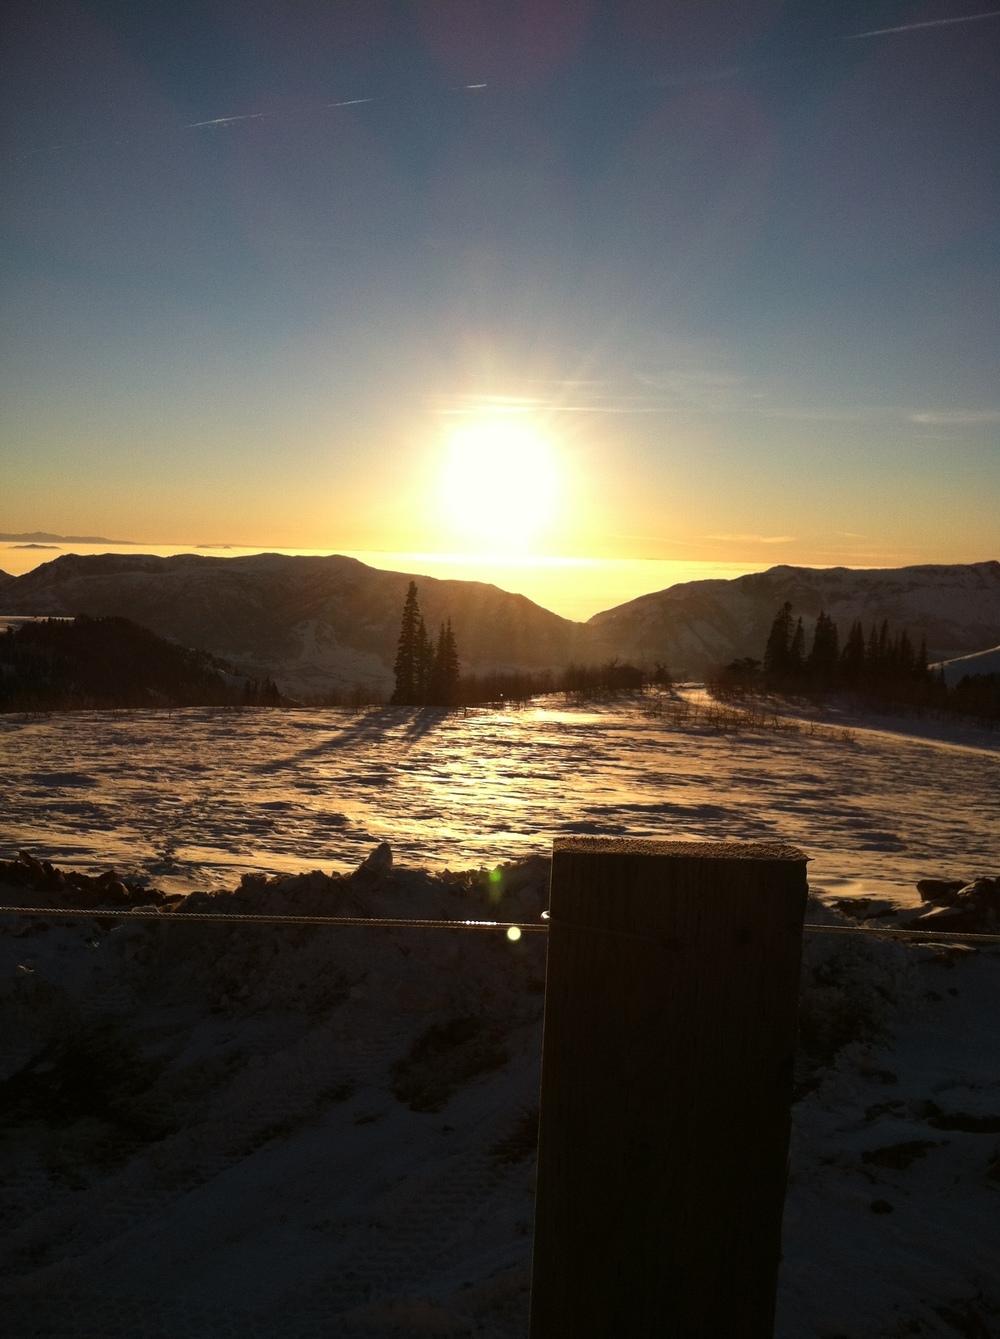 Sunset on Powder Mountain